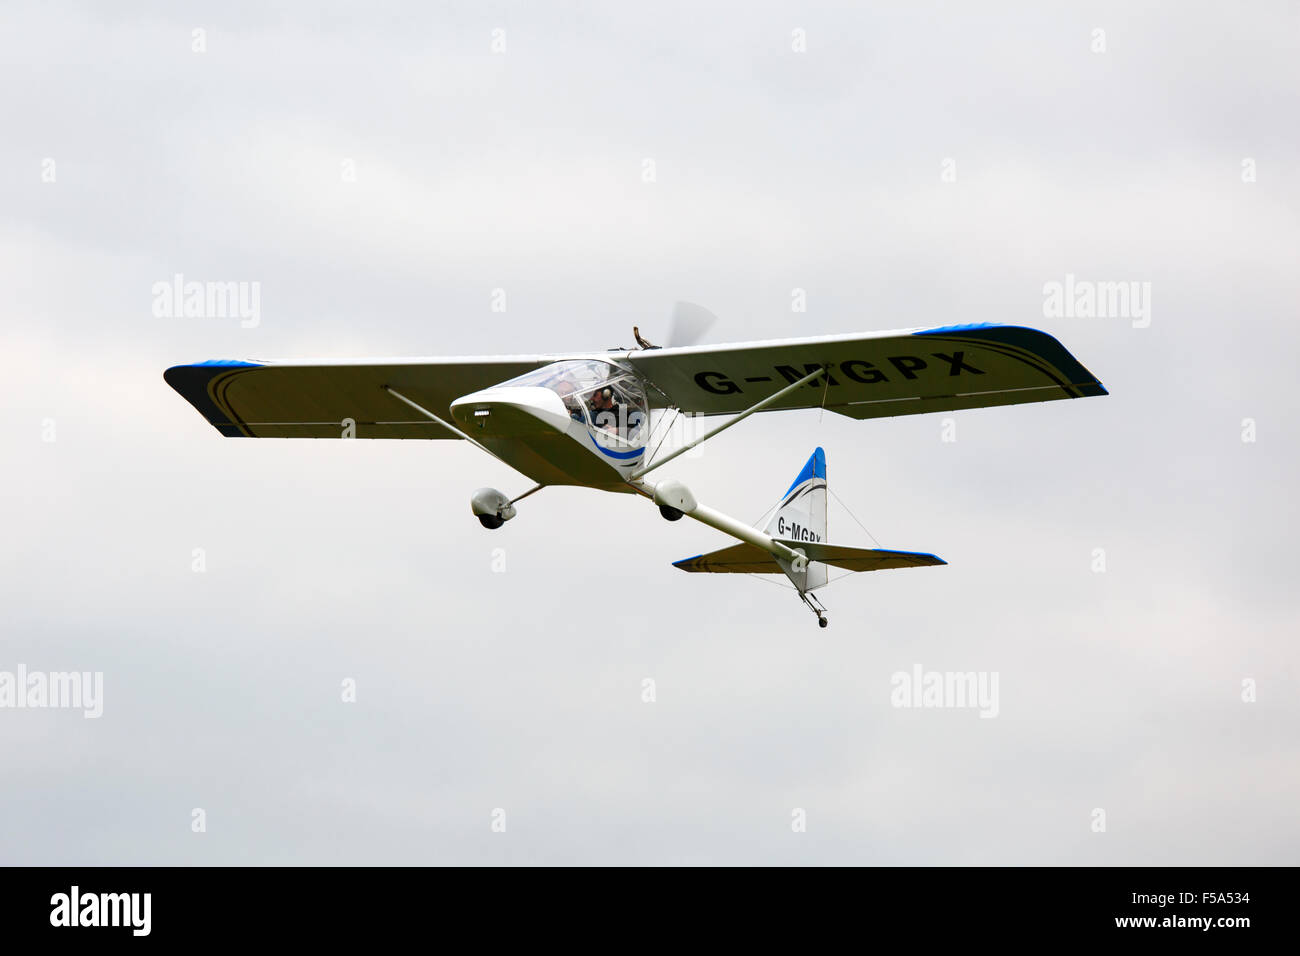 Kolb Twinstar MKII Xtra G-MGPX in flight at Breighton Airfield